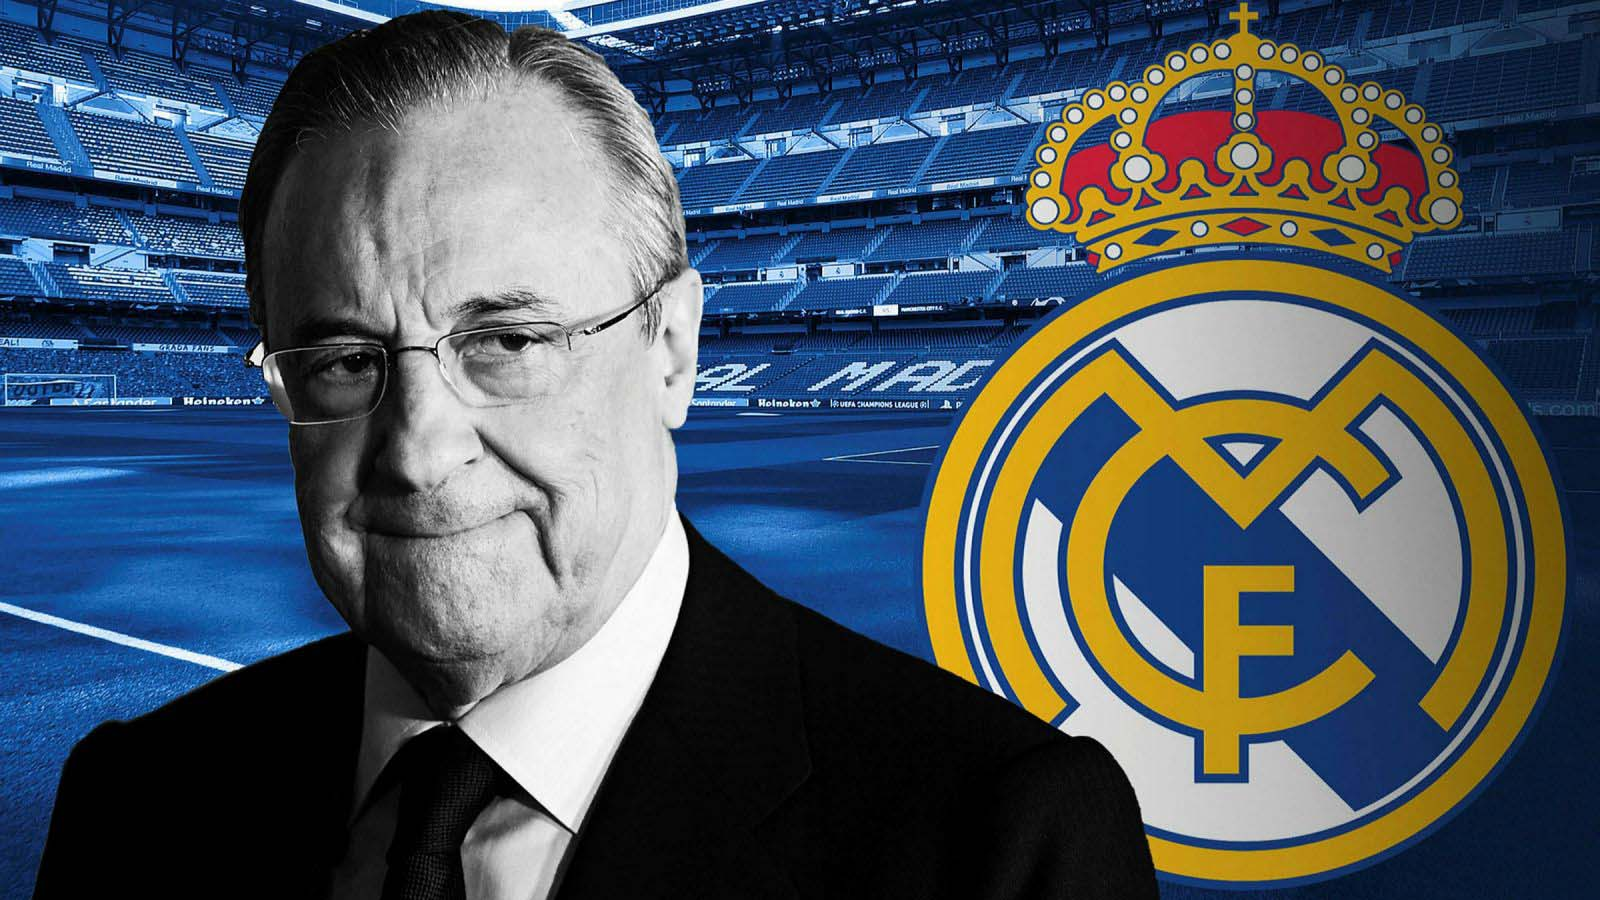 Real Madrid muốn gia nhập Premier League - Bóng Đá